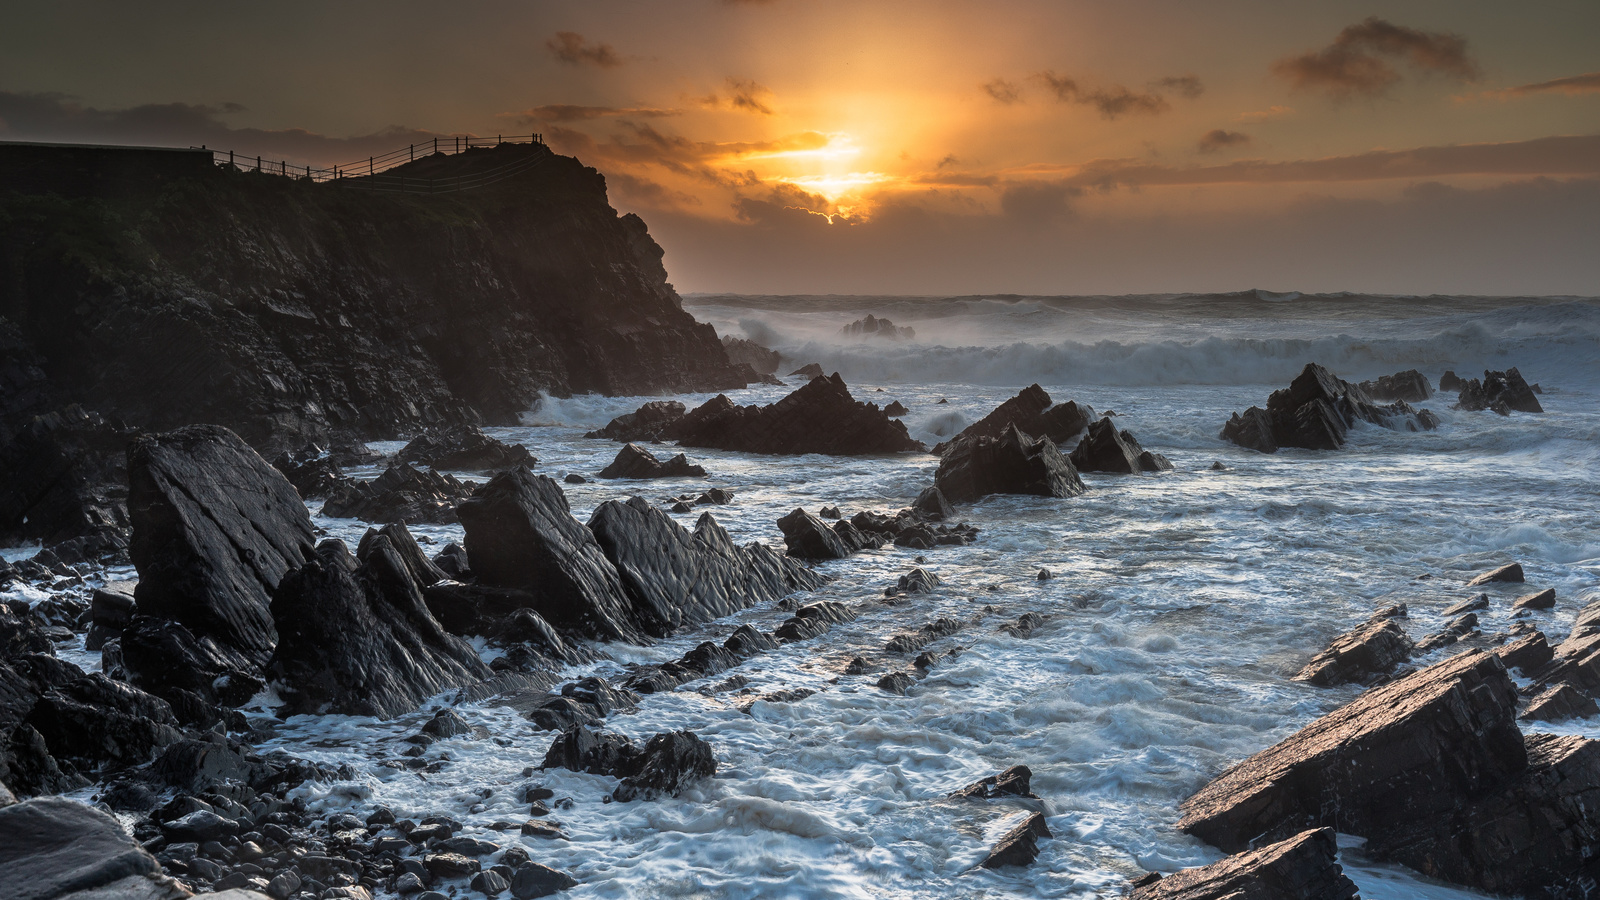 закат, море, скалы, волны, пейзаж